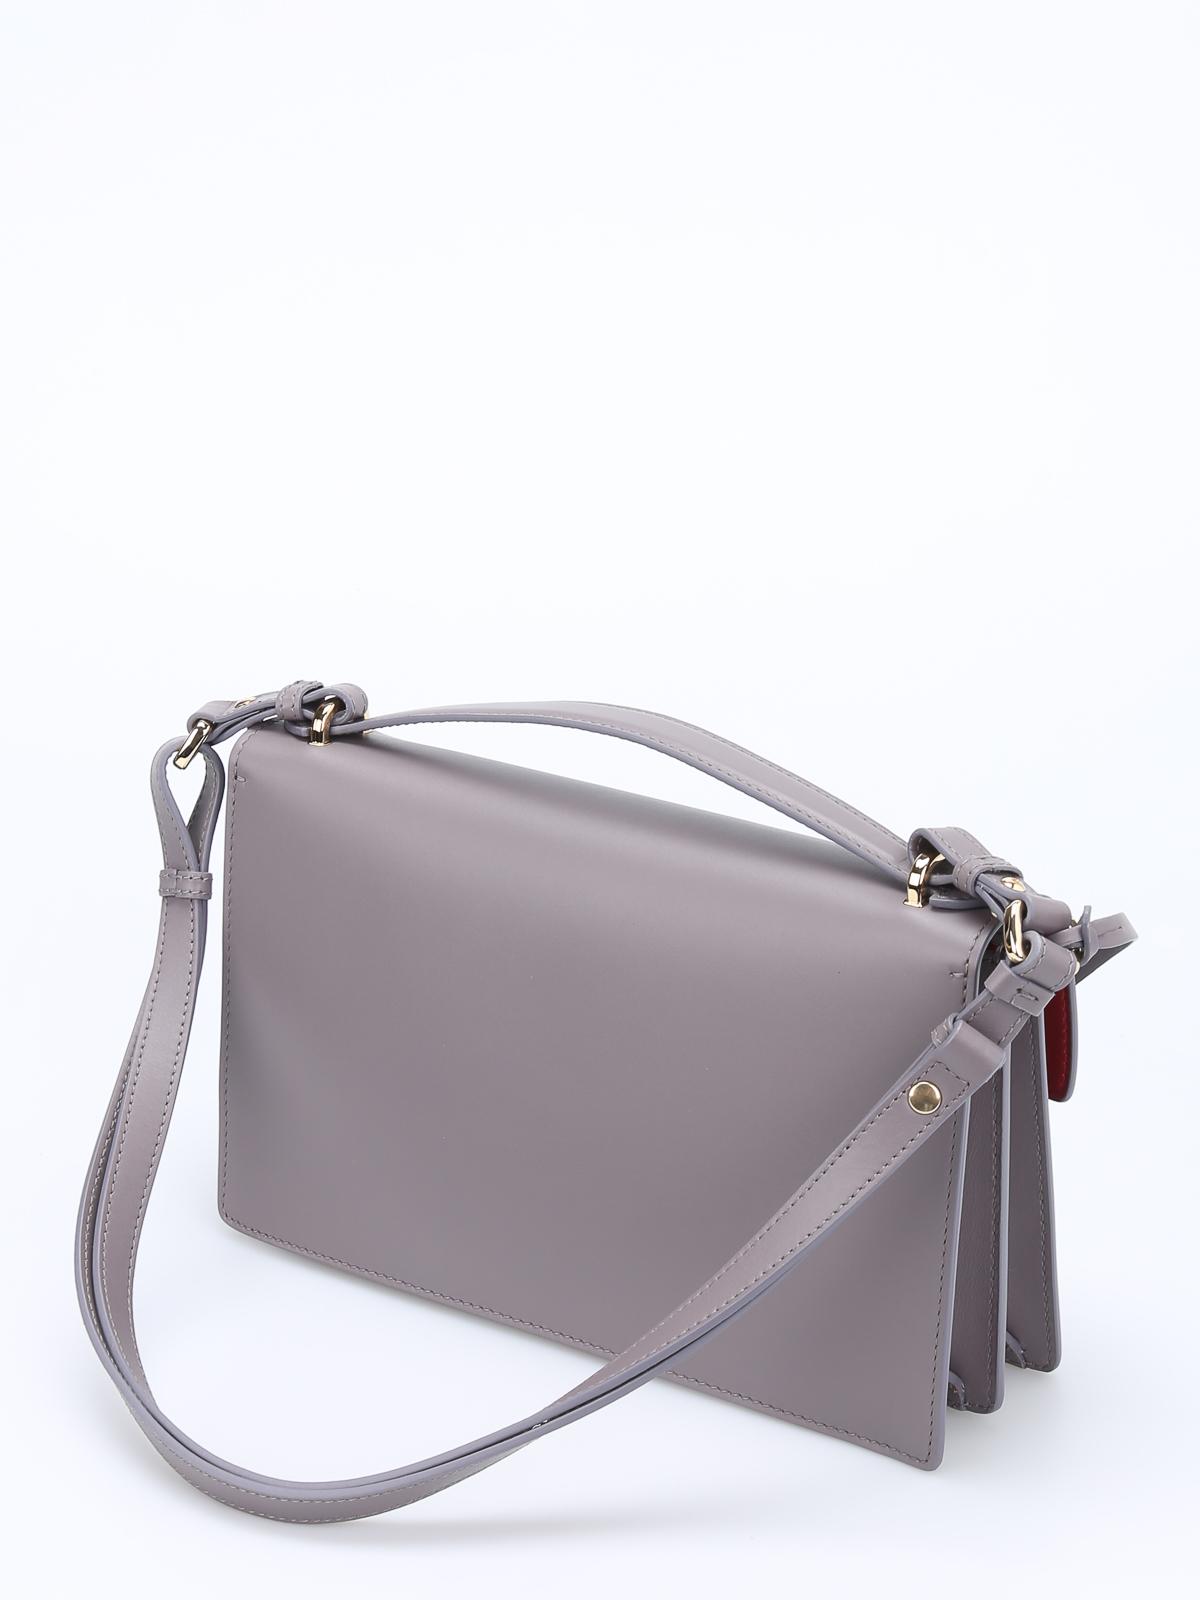 cda8ec8553 iKRIX SALVATORE FERRAGAMO  cross body bags - Aileen leather crossbody bag